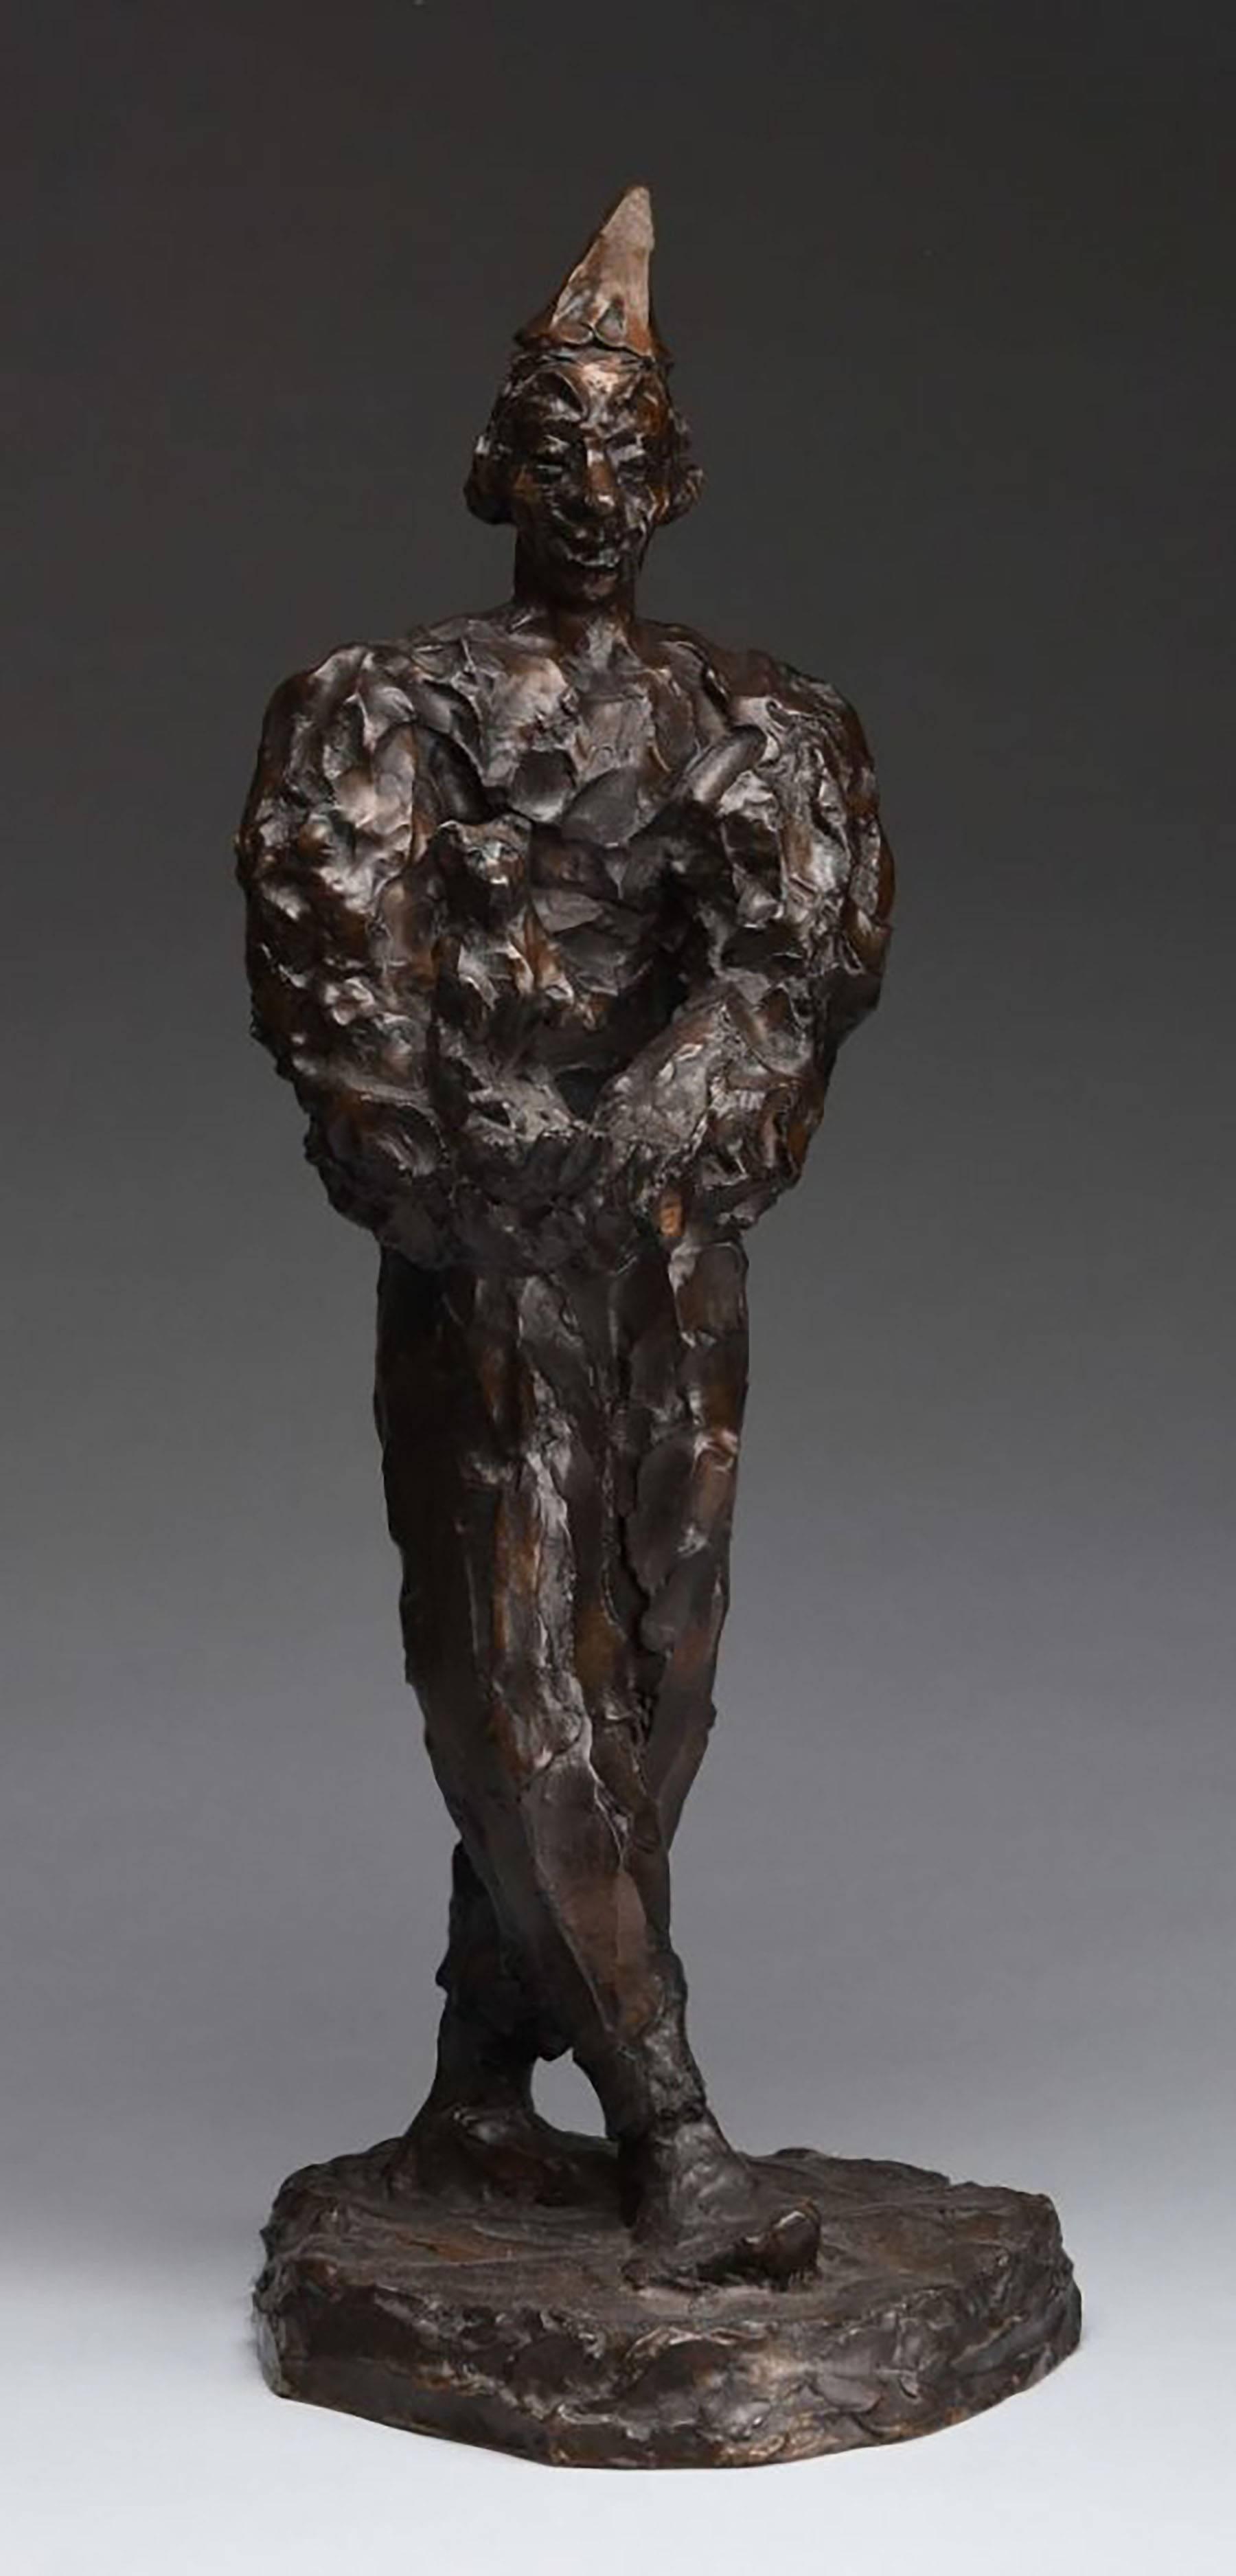 Clown Holding Teddy Bear, Unique Bronze Expressionist Sculpture